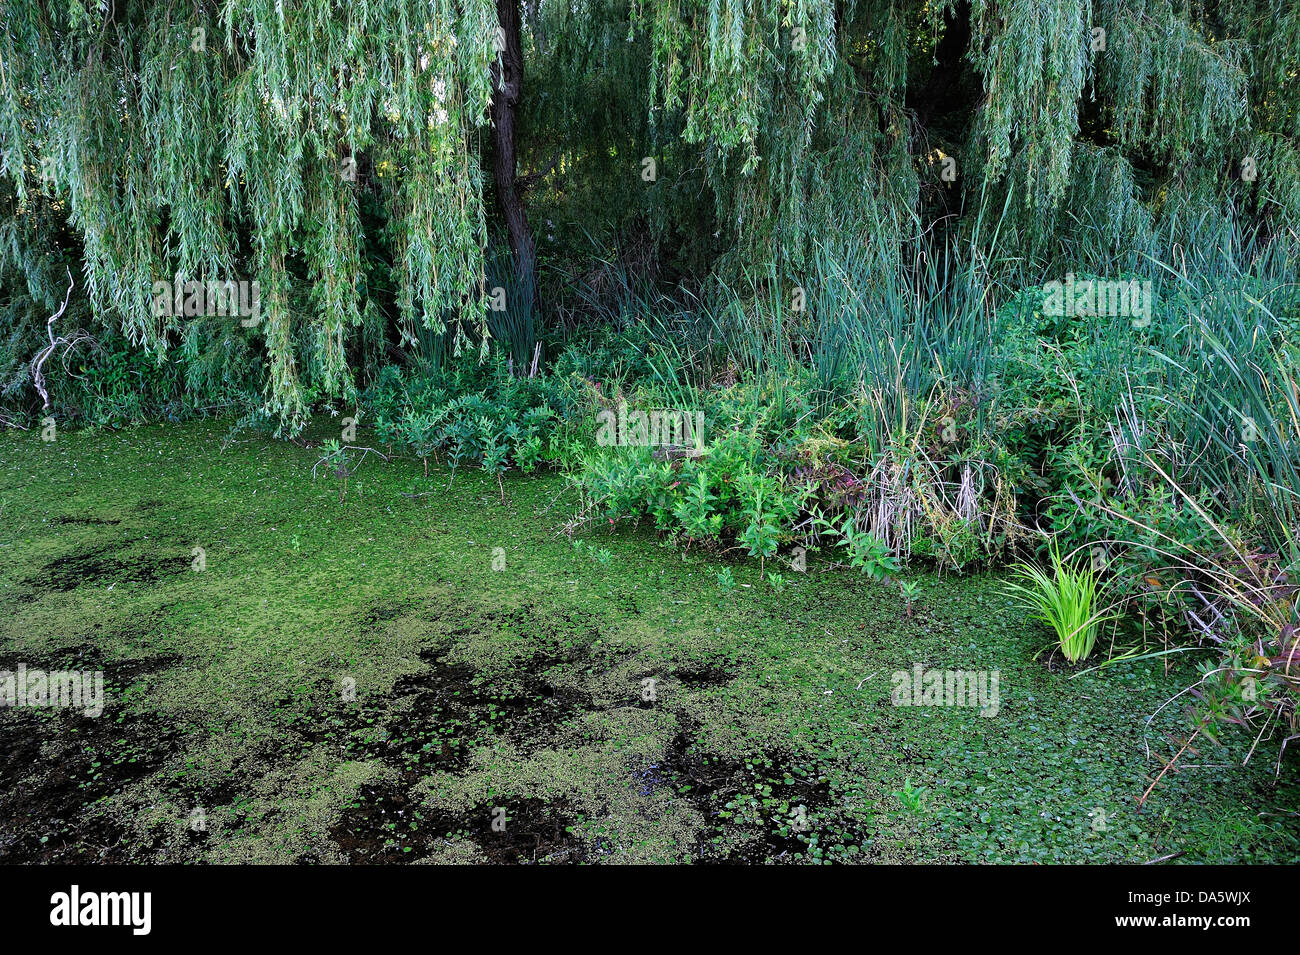 Sumpf, Moor, Sumpf, Heiligtum Teich, Point Pelee, Nationalpark, Leamington, Ontario, Kanada, Stockbild